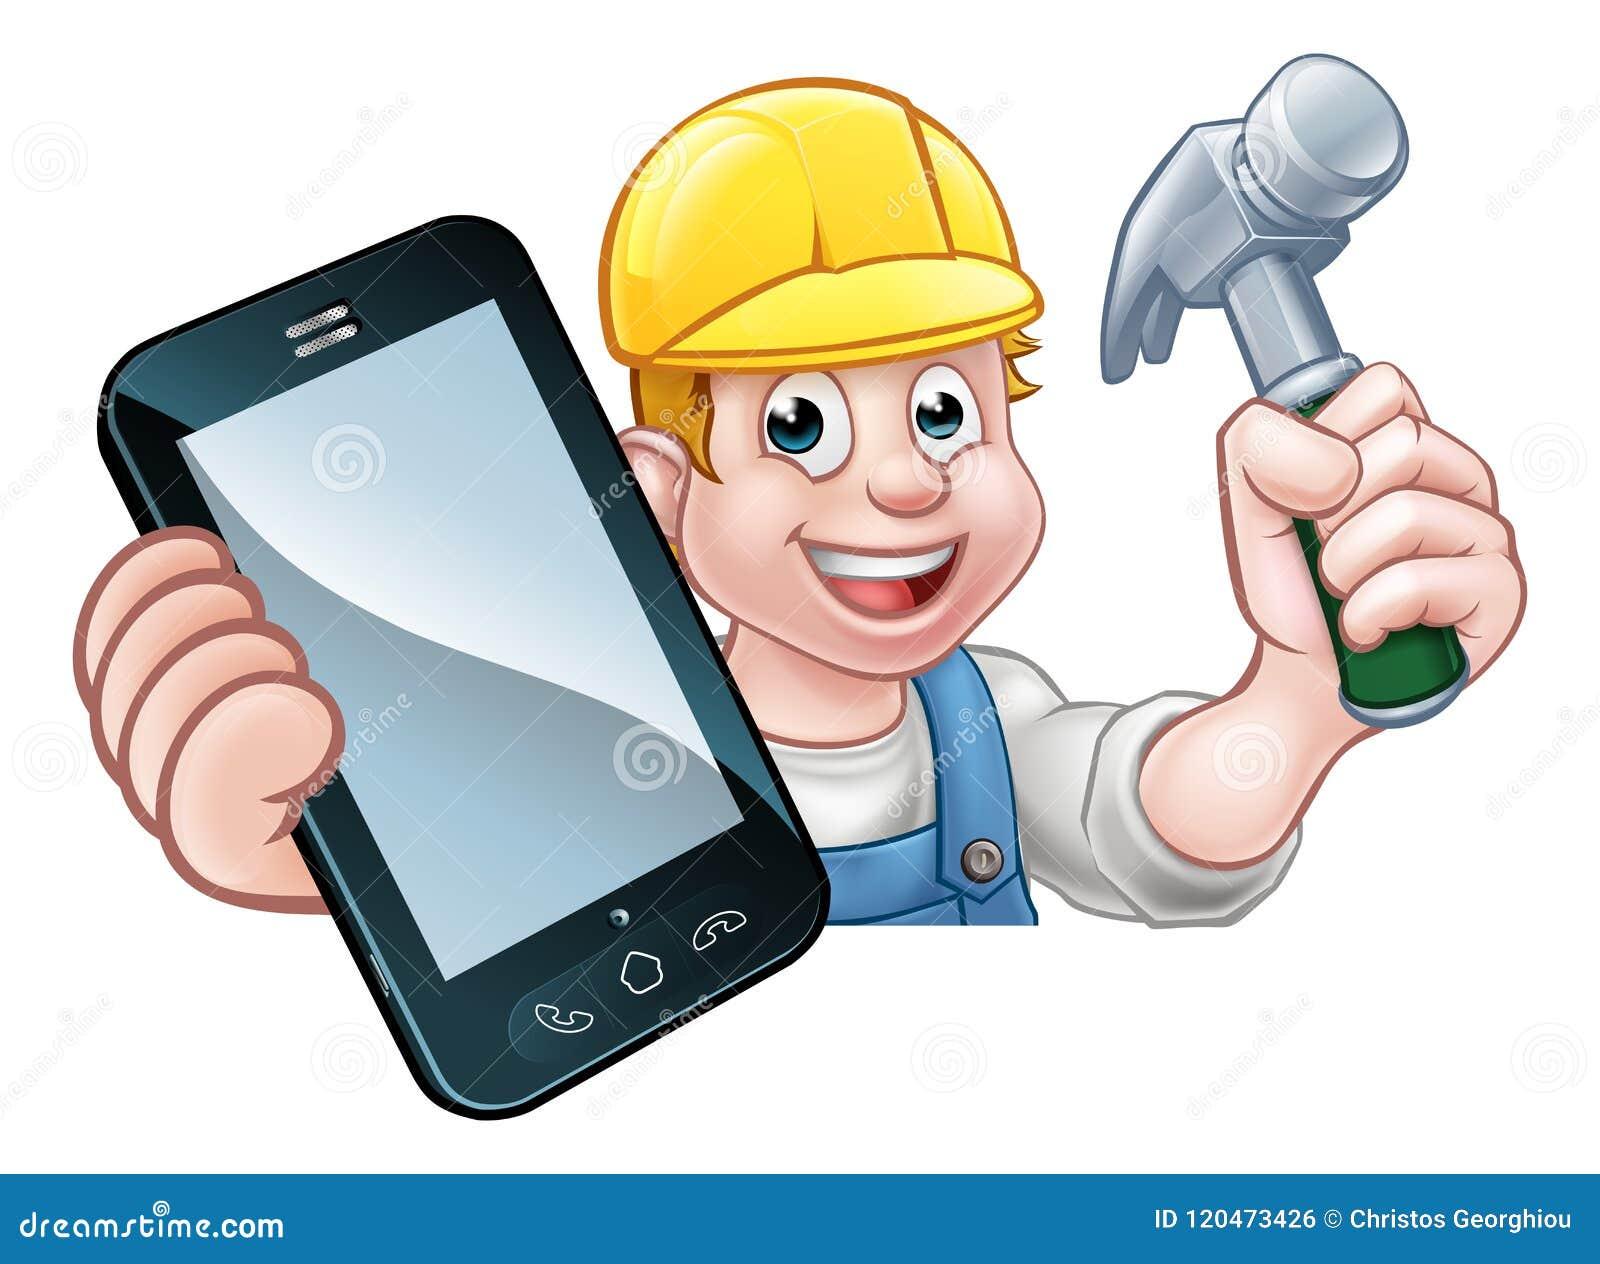 Carpenter Handyman Phone Concept Stock Vector - Illustration of ... 12807216d23e